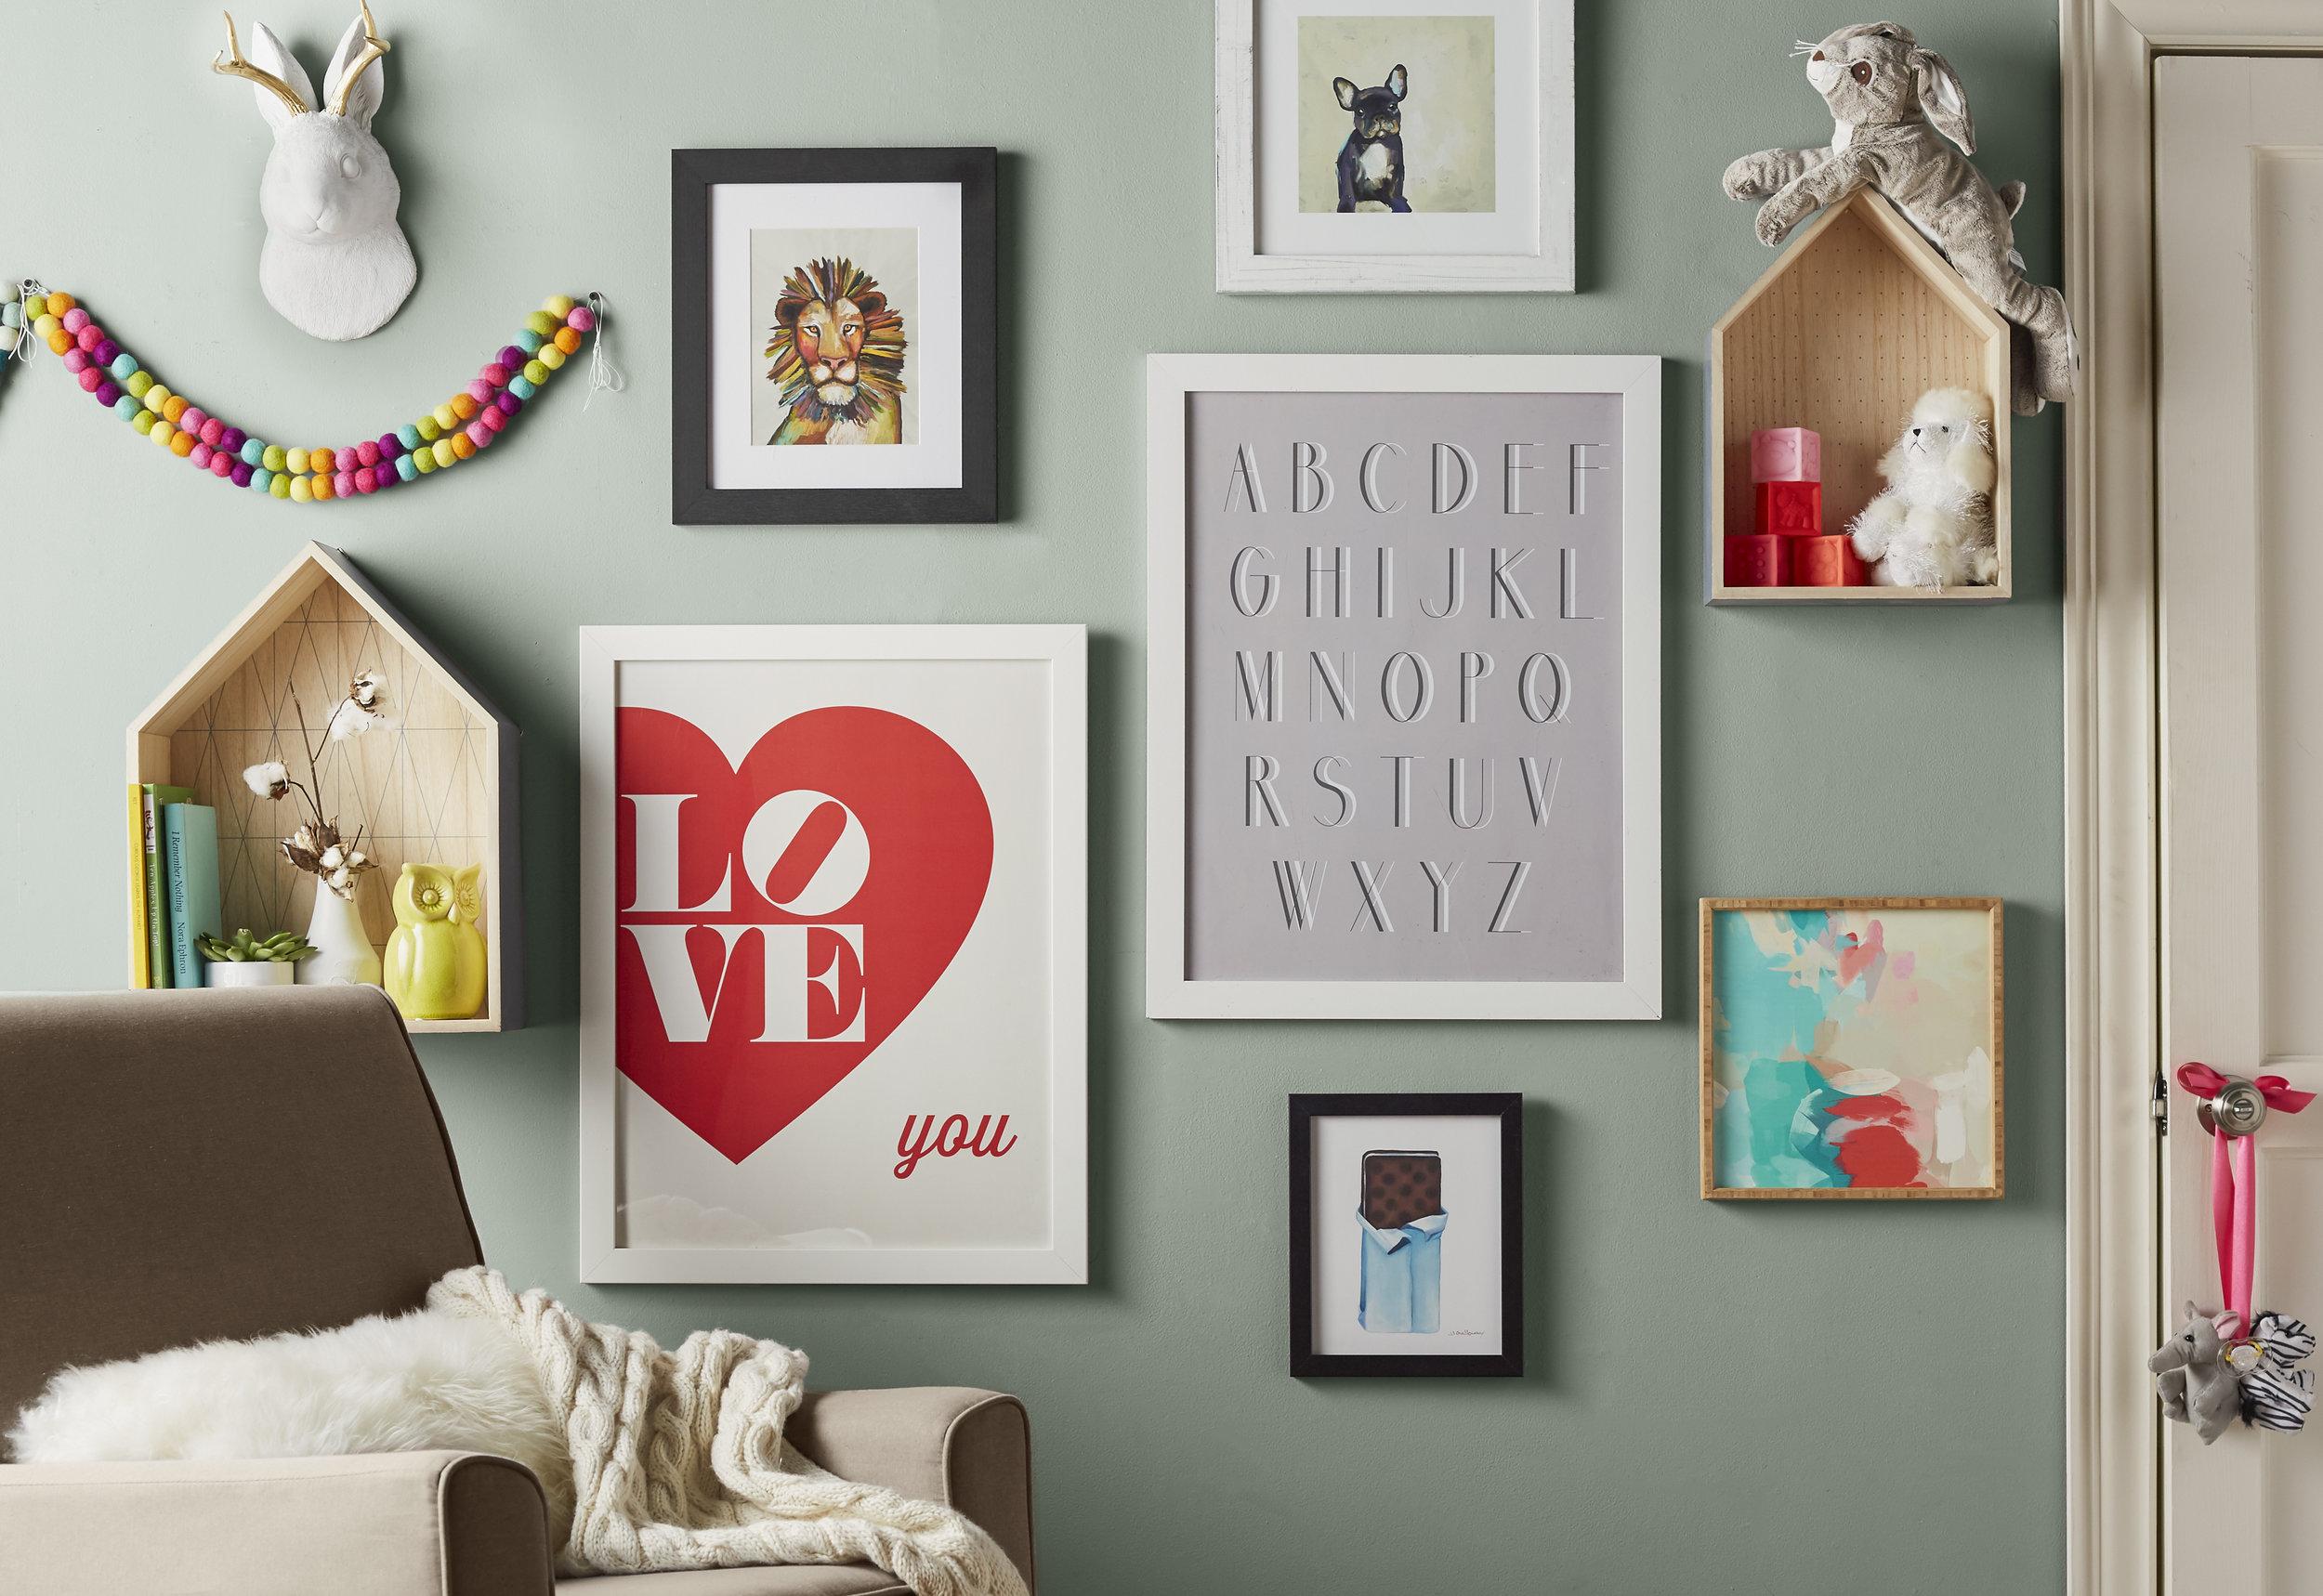 Joss & Main home decor photography by Sarah Dickenson